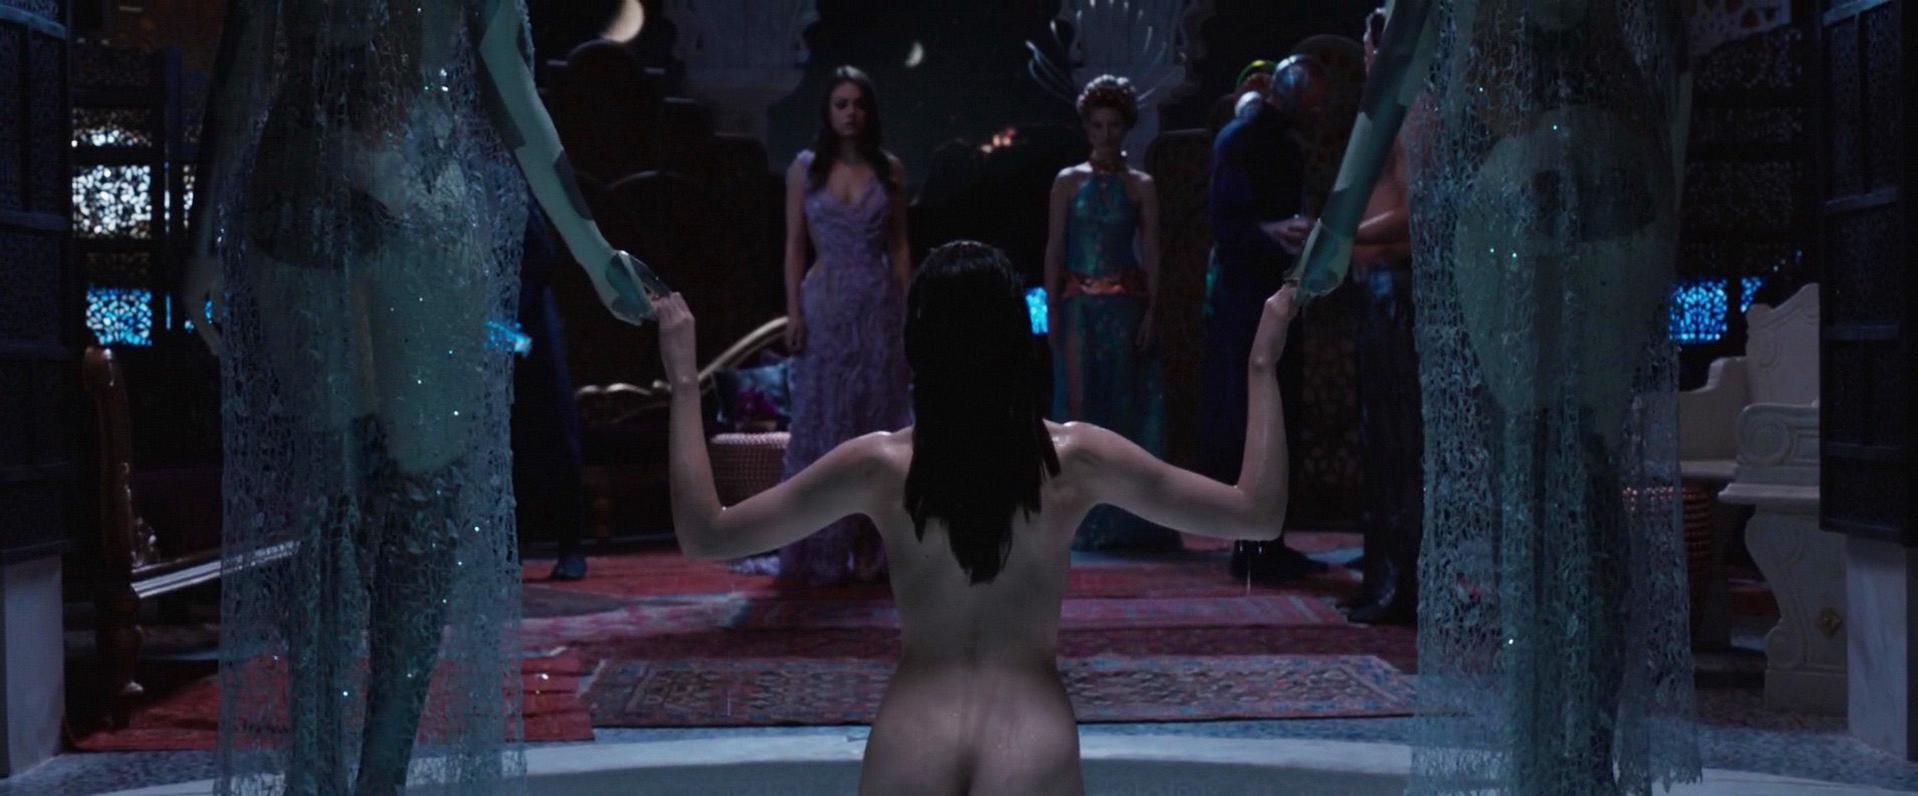 Celebrites Lina Esco nude (68 photos), Tits, Bikini, Selfie, cleavage 2019